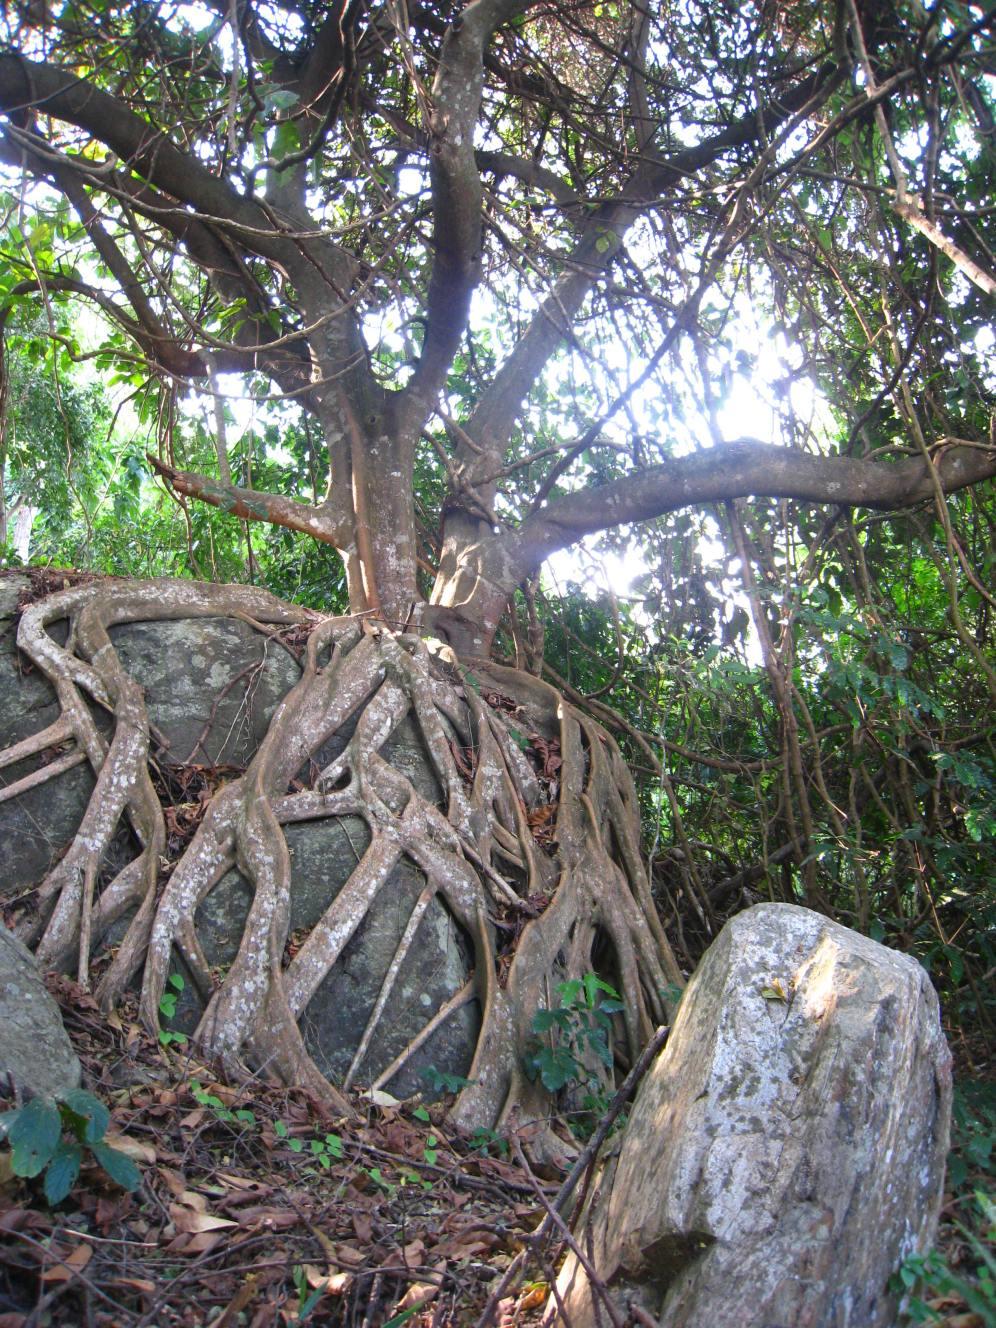 roots parasite tree Udzungwa glacier boma africa safari tanzania kilimanjaro wildlife